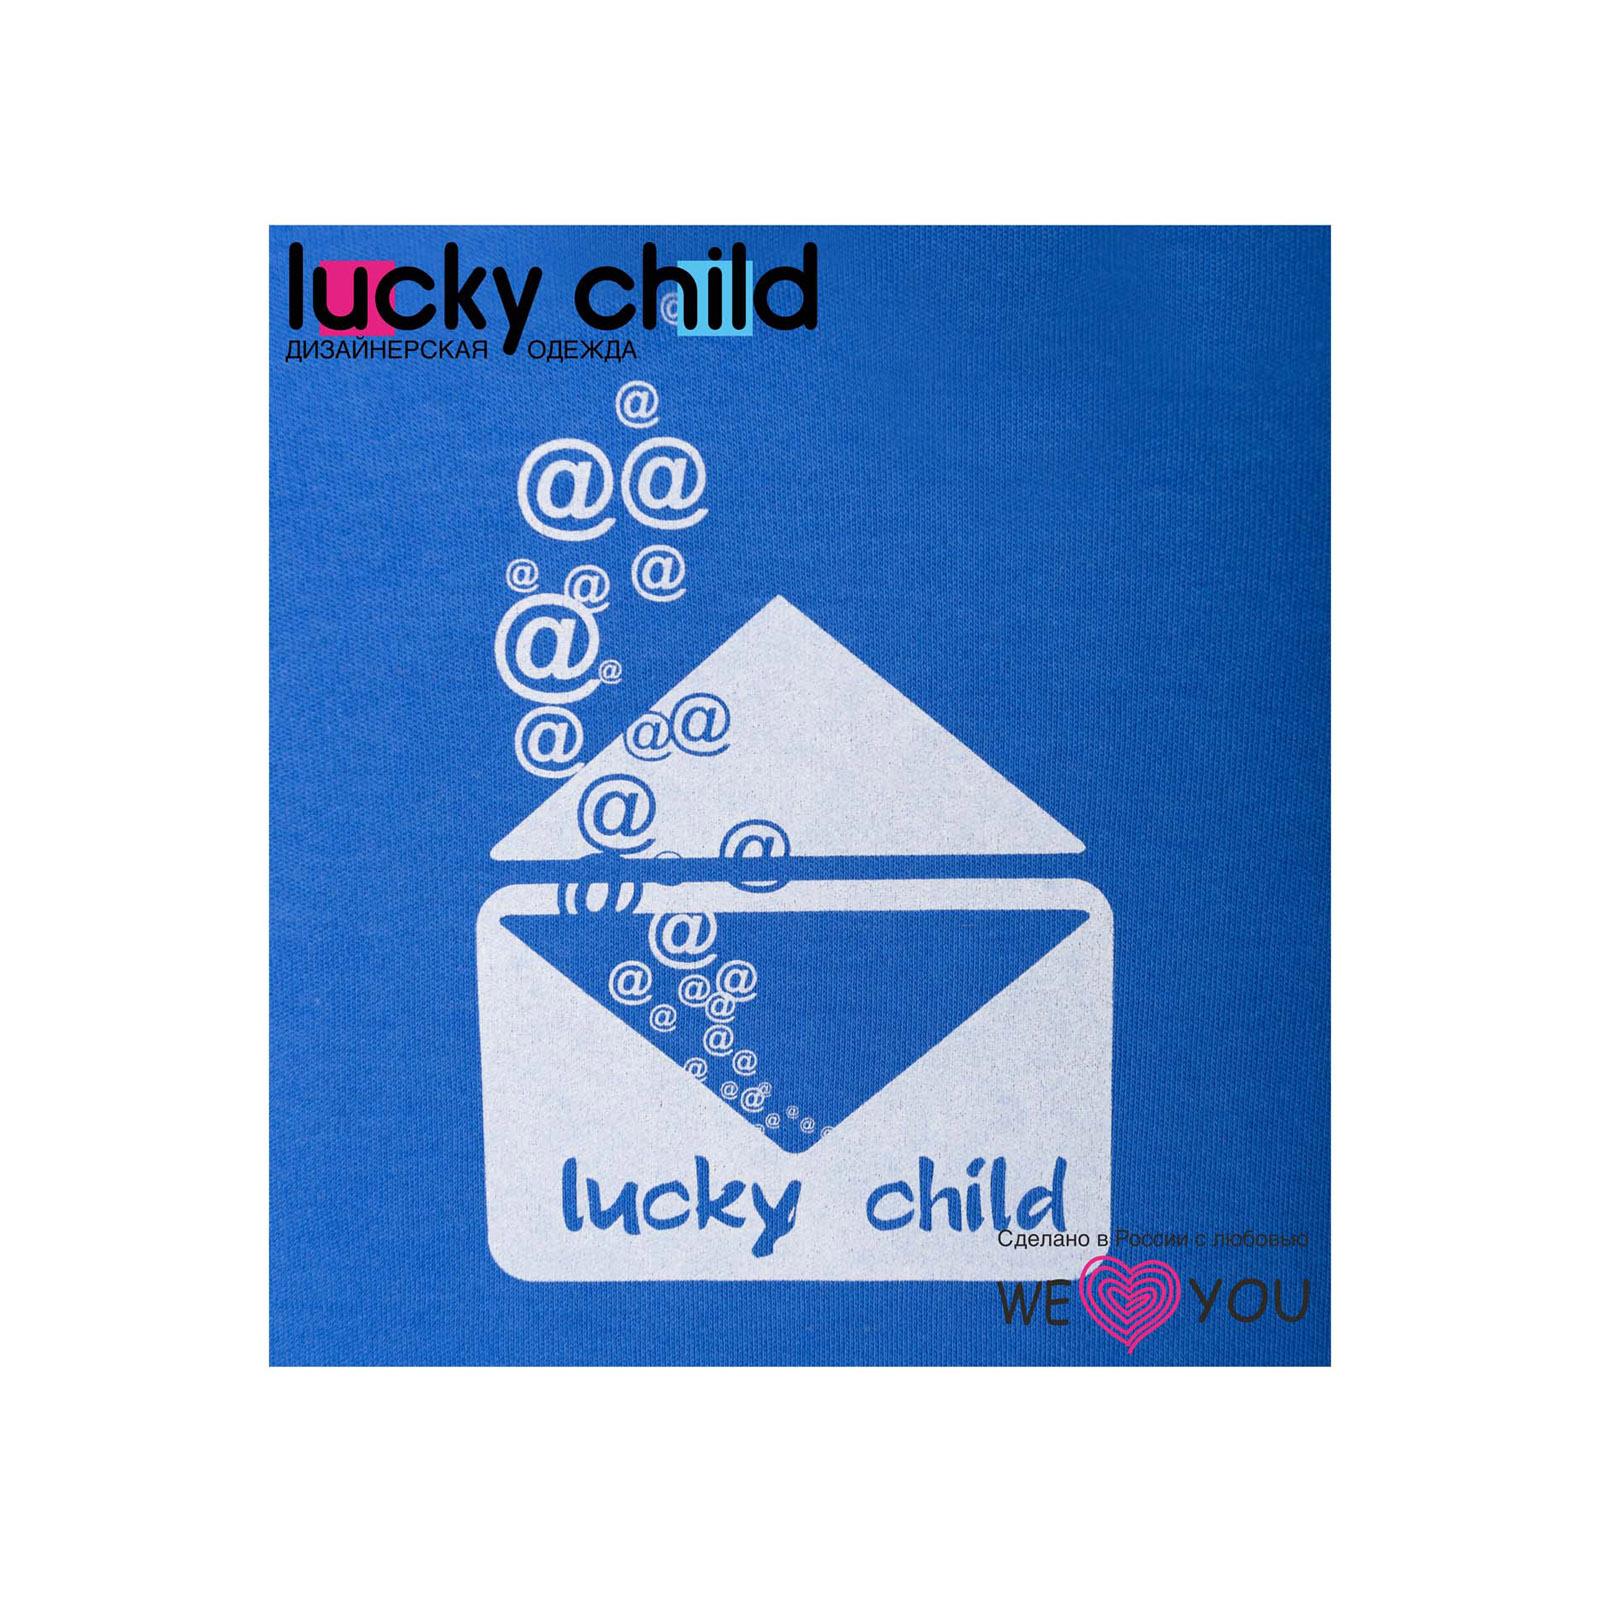 ��������� Lucky Child ��������� ���� ����� � ����� ������ 92